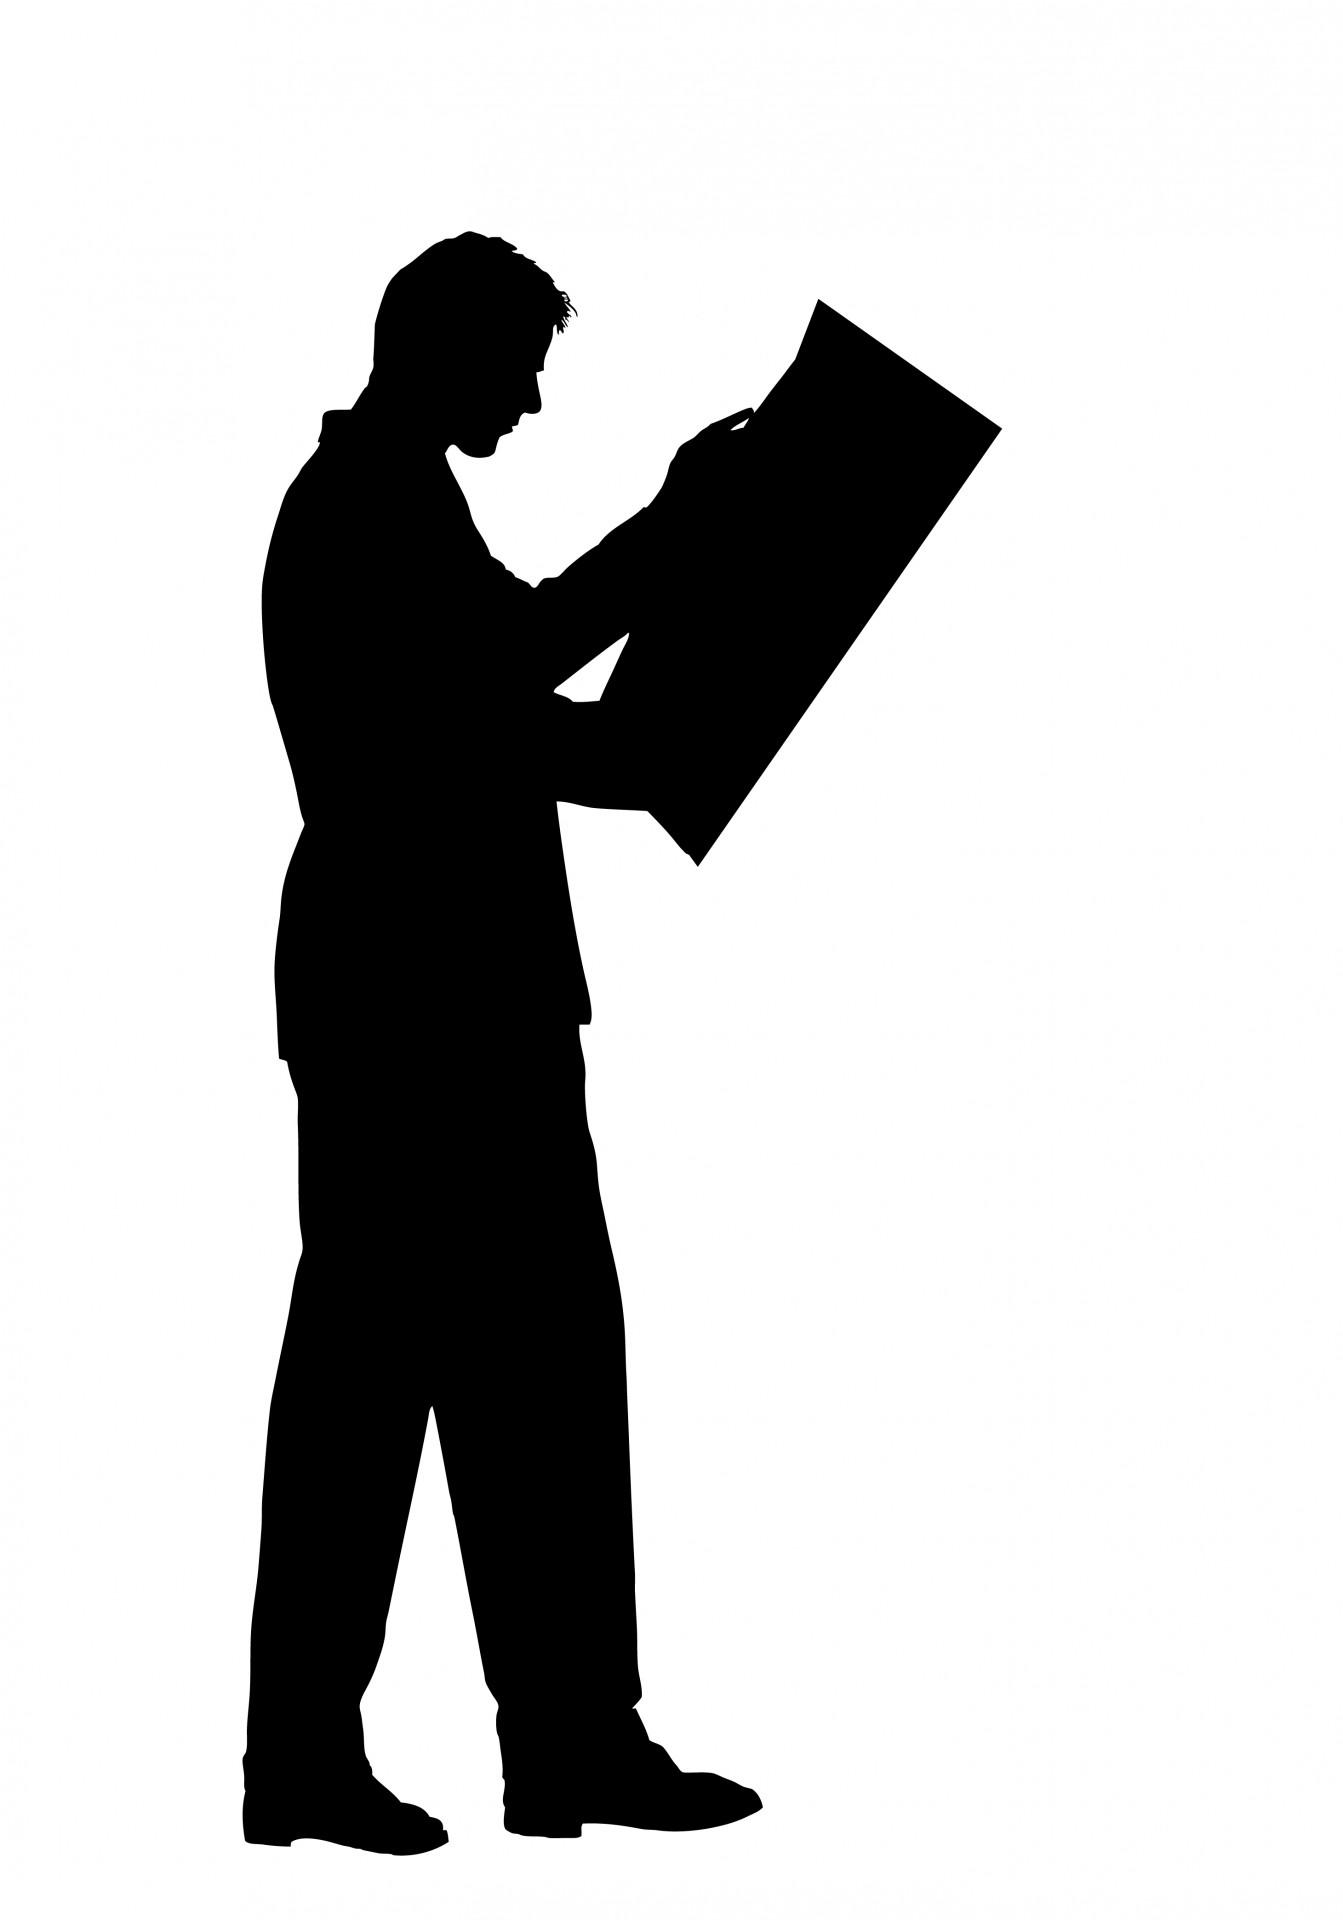 1343x1920 Man Reading Newspaper Silhouette Free Stock Photo